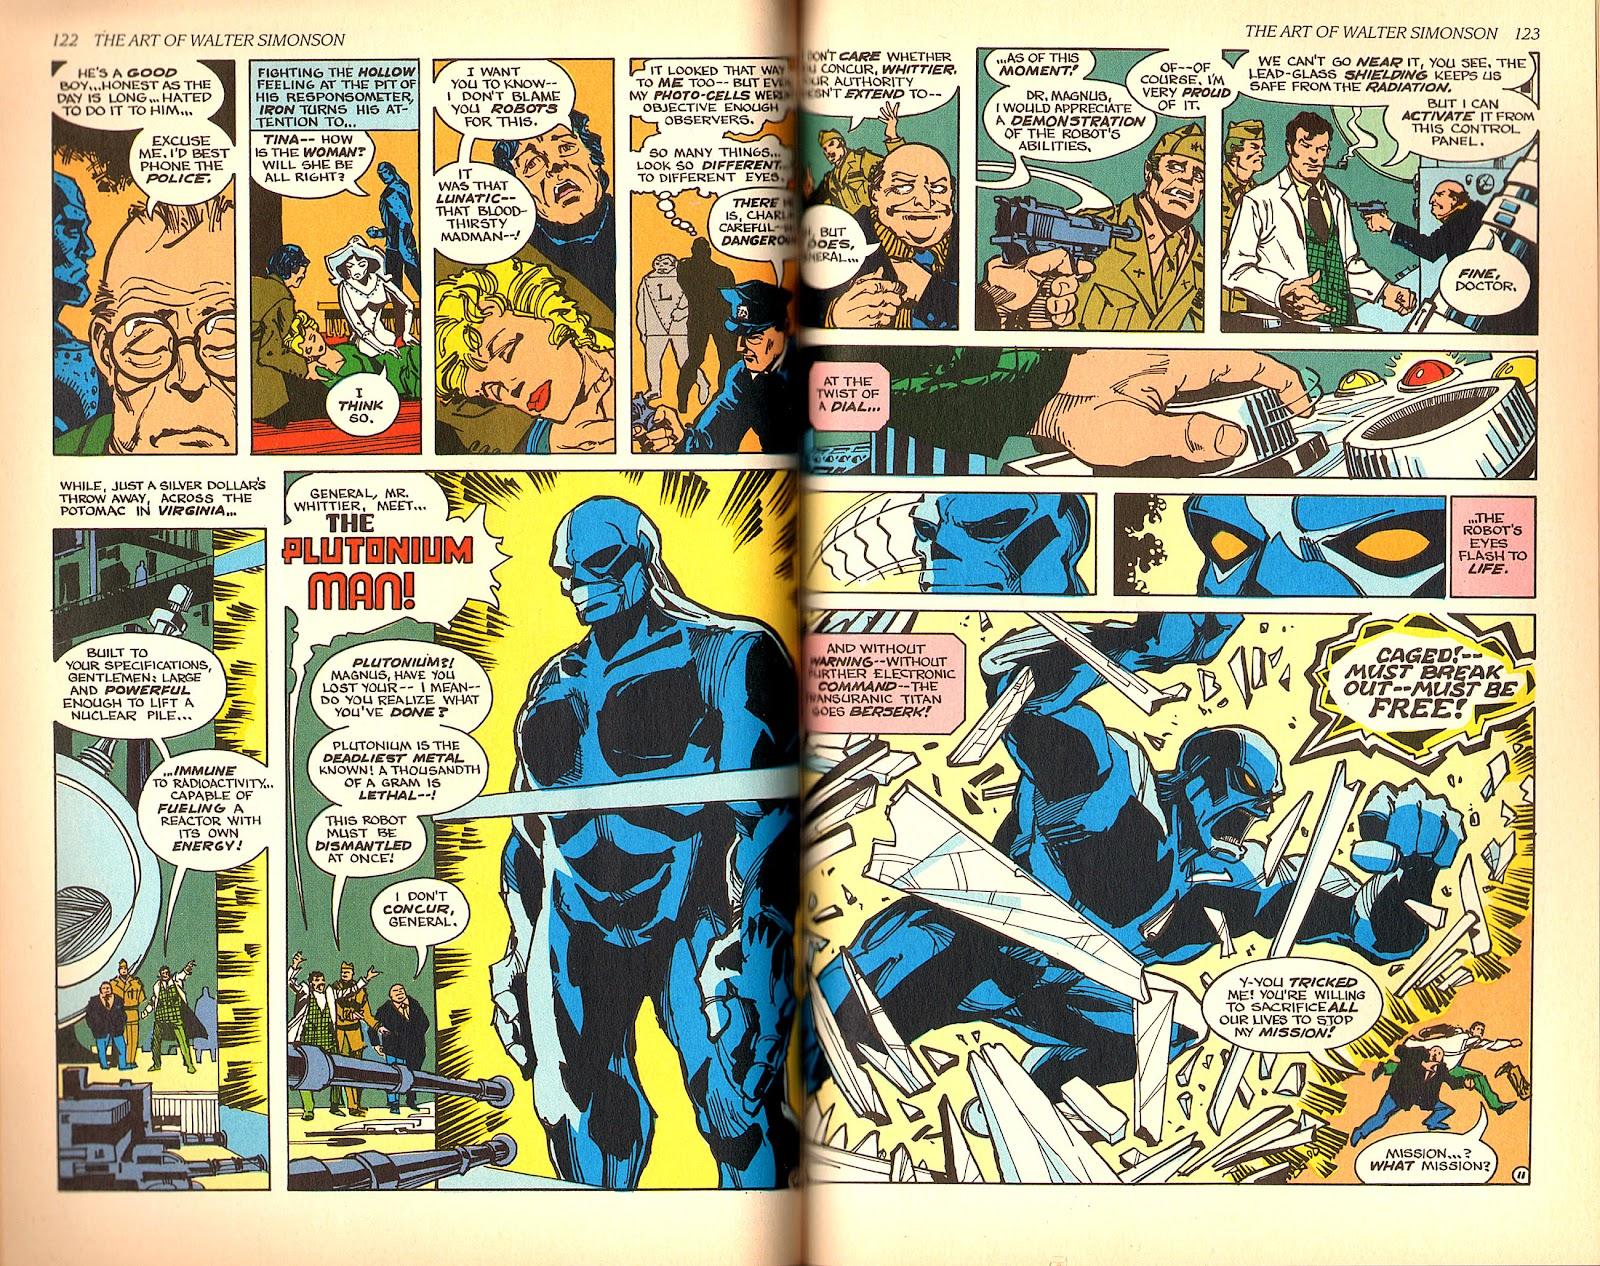 Read online The Art of Walter Simonson comic -  Issue # TPB - 63